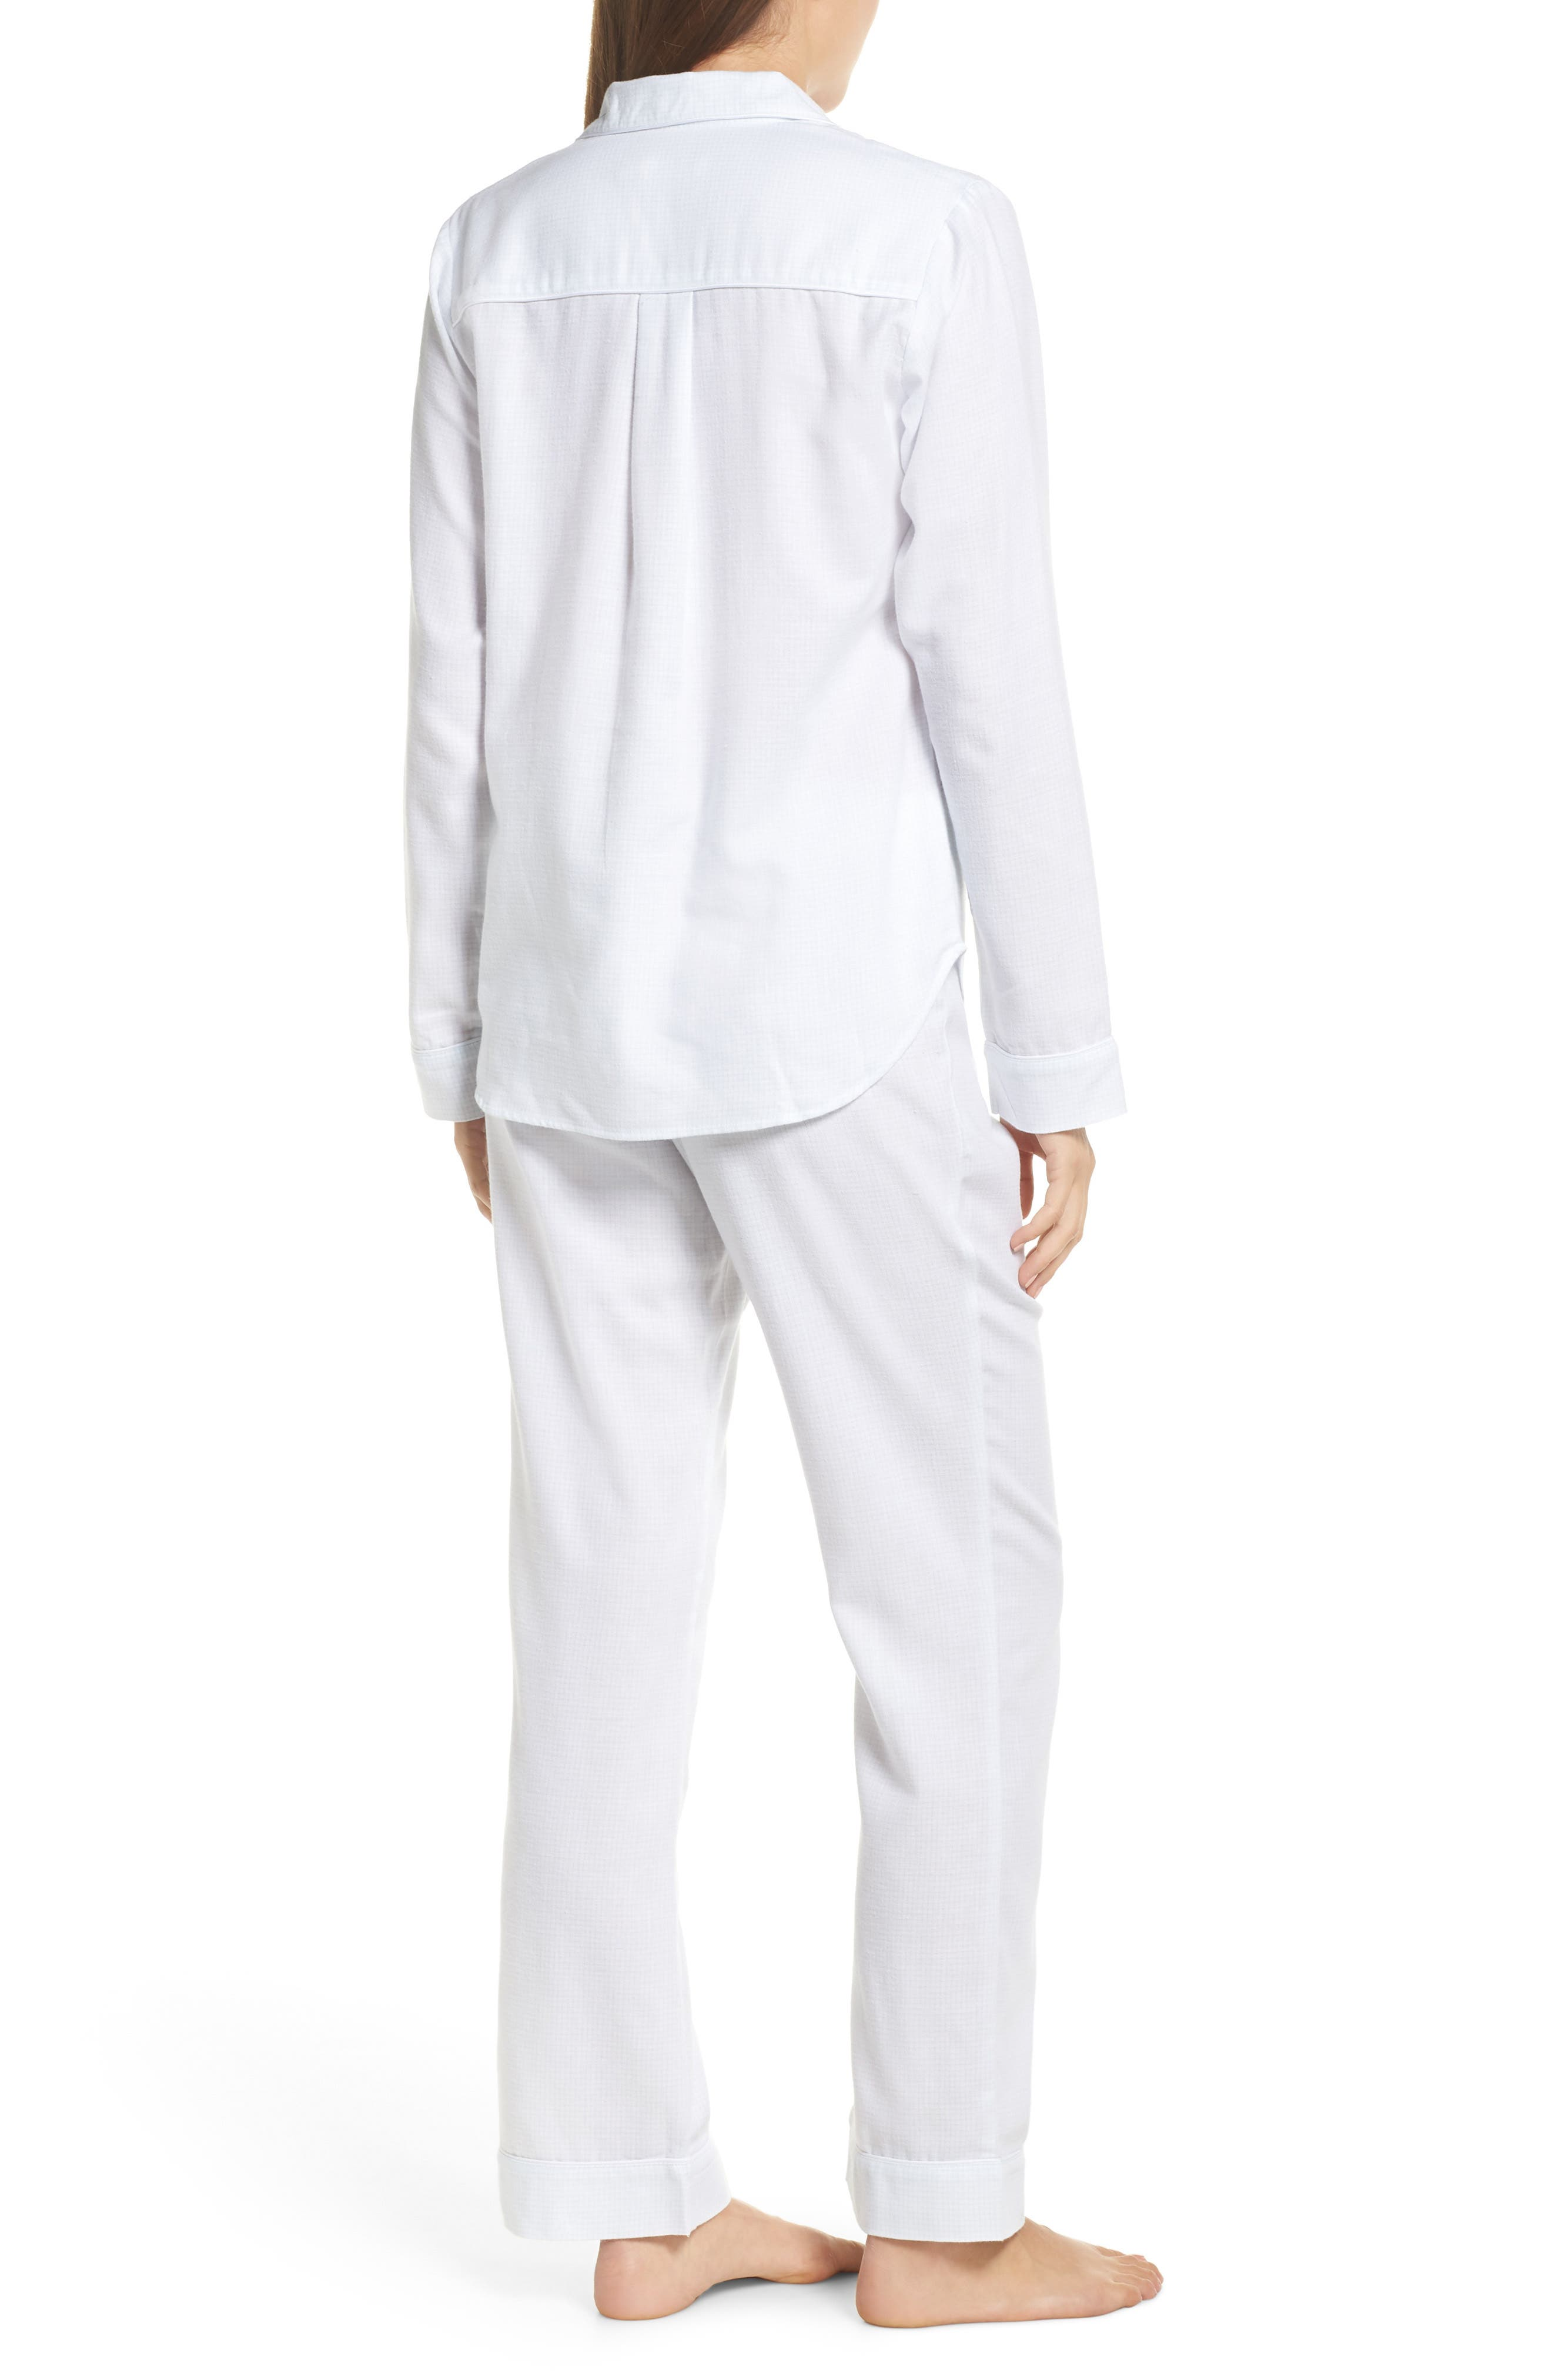 Raven Plaid Pajamas,                             Alternate thumbnail 2, color,                             WHITE / SKY BLUE CHECK